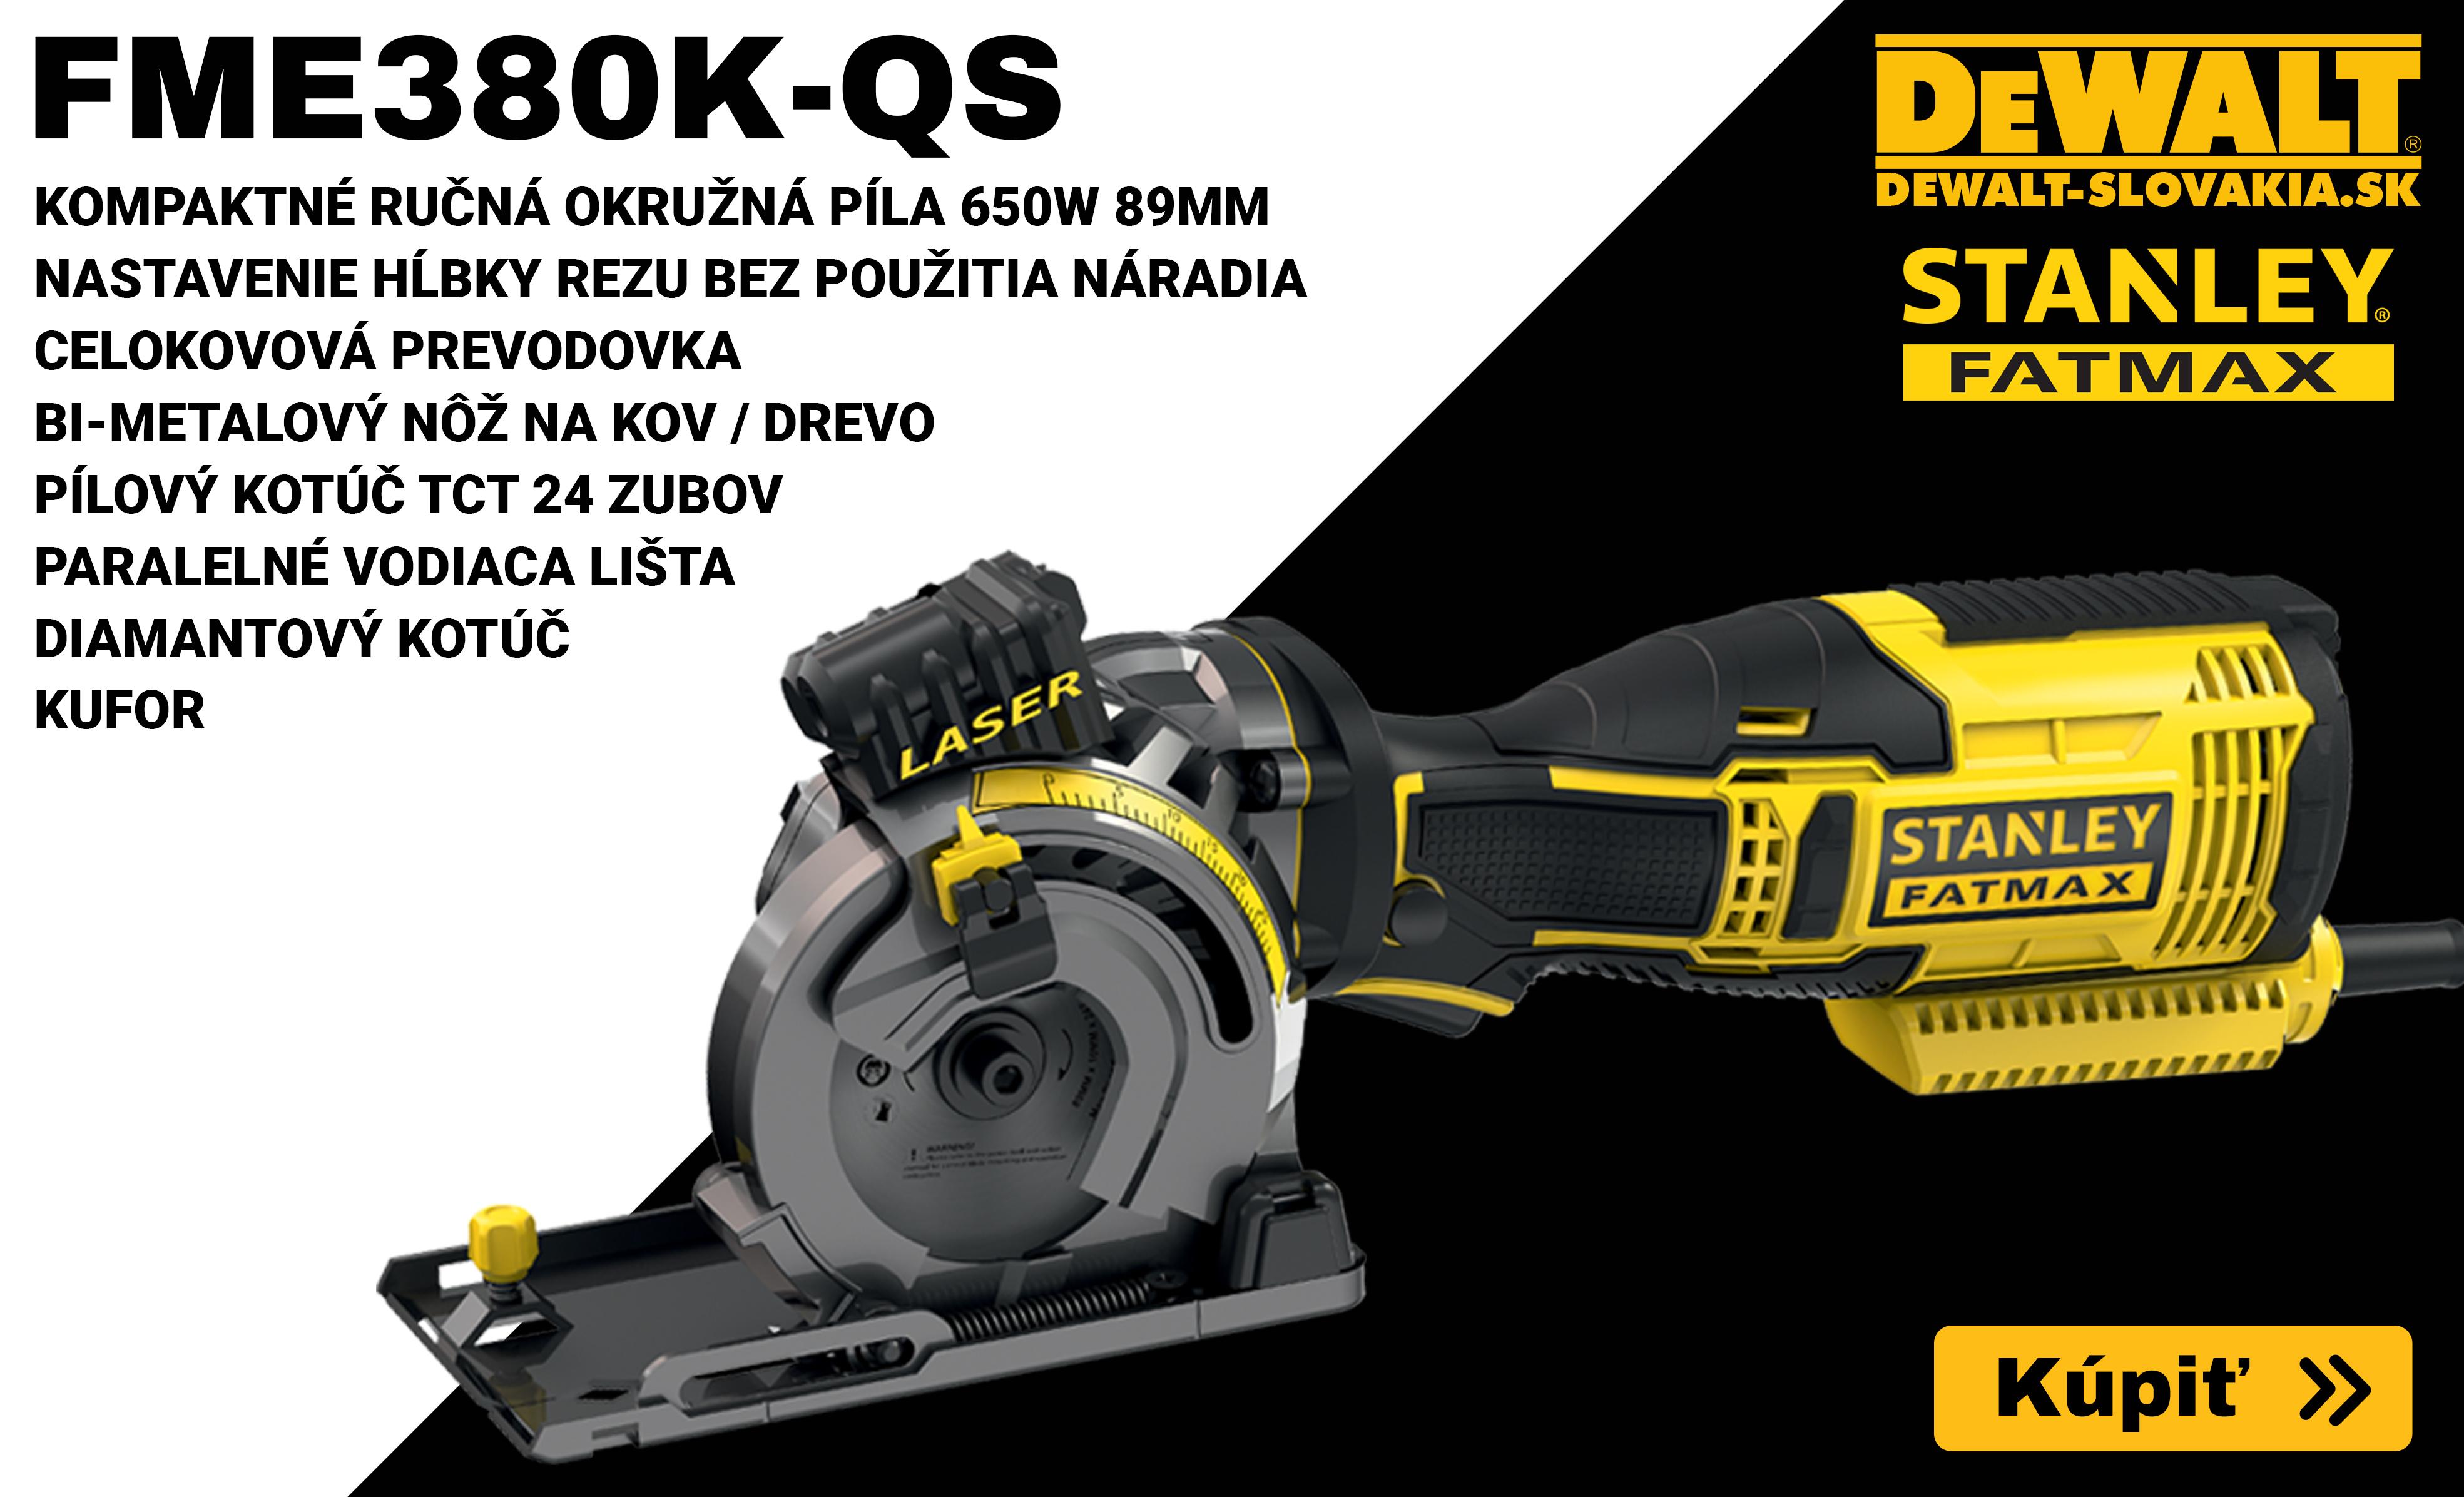 FME380K-QS